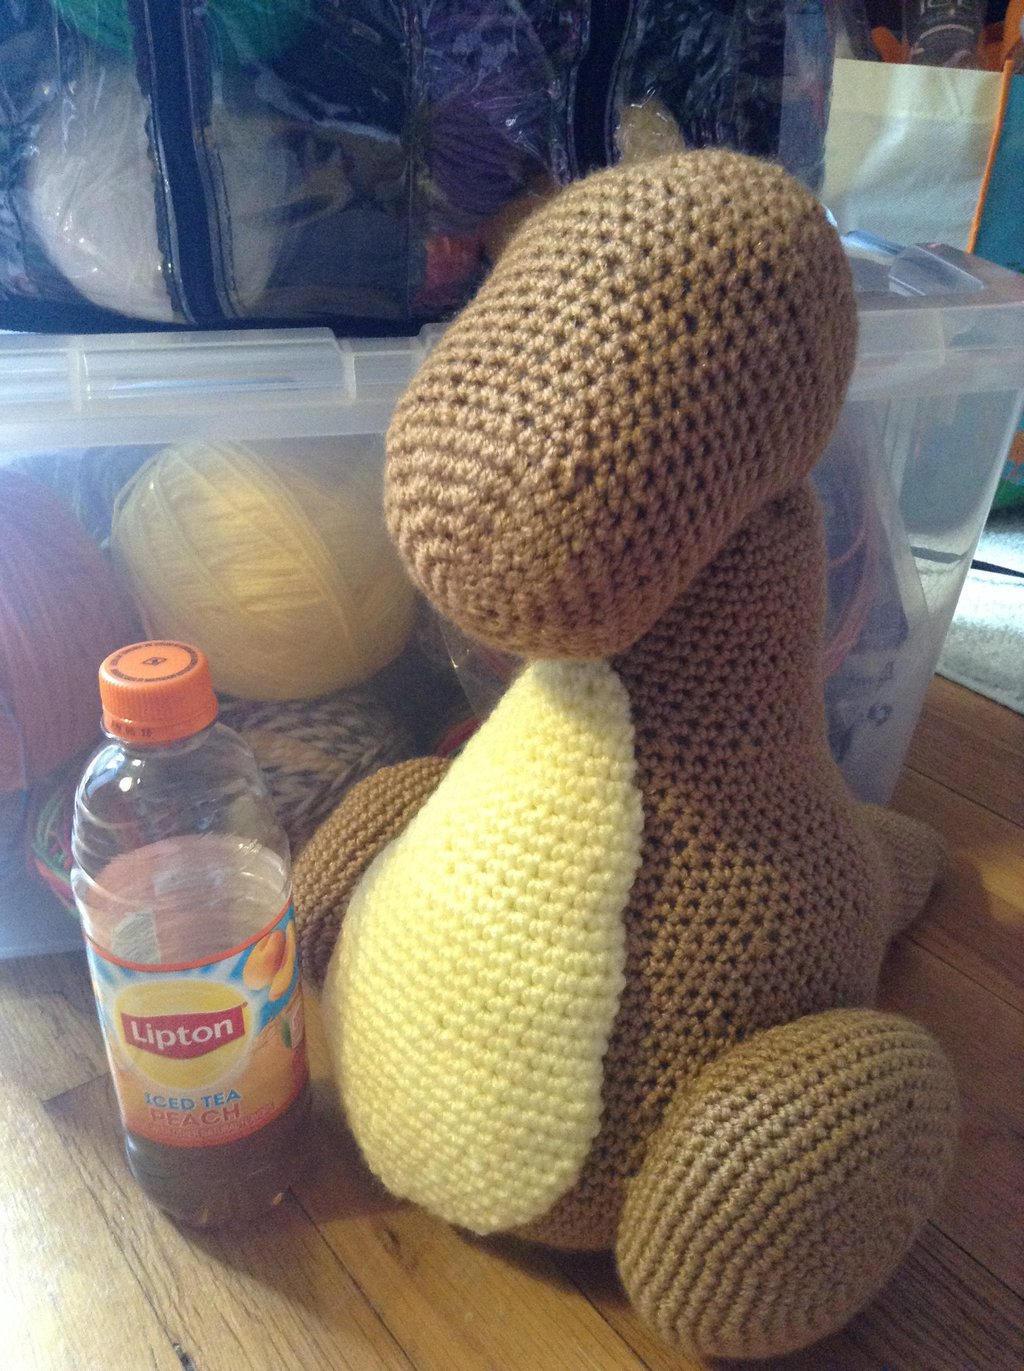 Amigurumi Yarn Size : Life-Size Cubone Amigurumi WIP #6 by Krejdar on DeviantArt